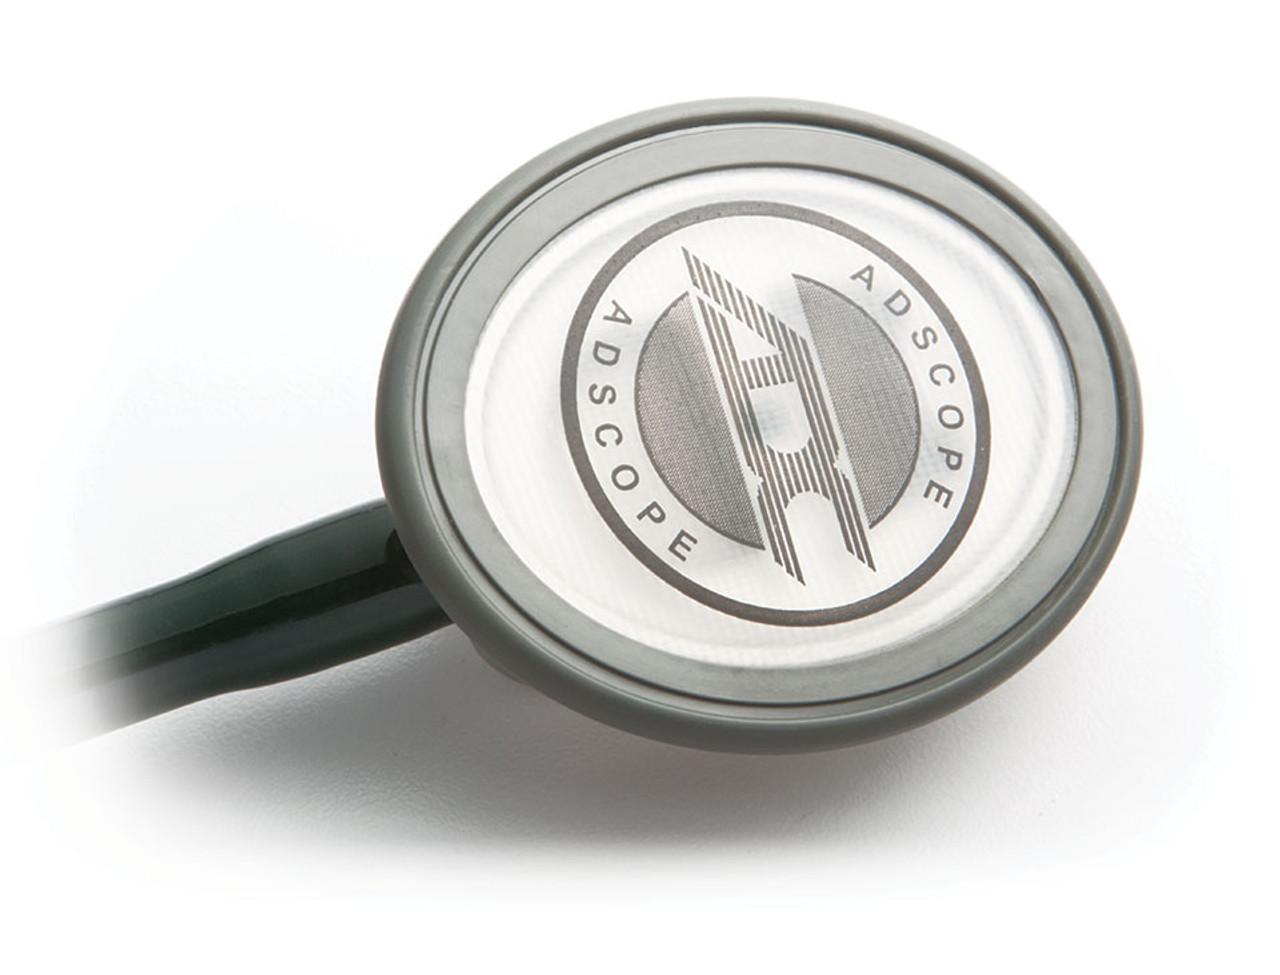 ADC 600 Single Head Advanced Diagnostic Stethoscope, Black, 600BK